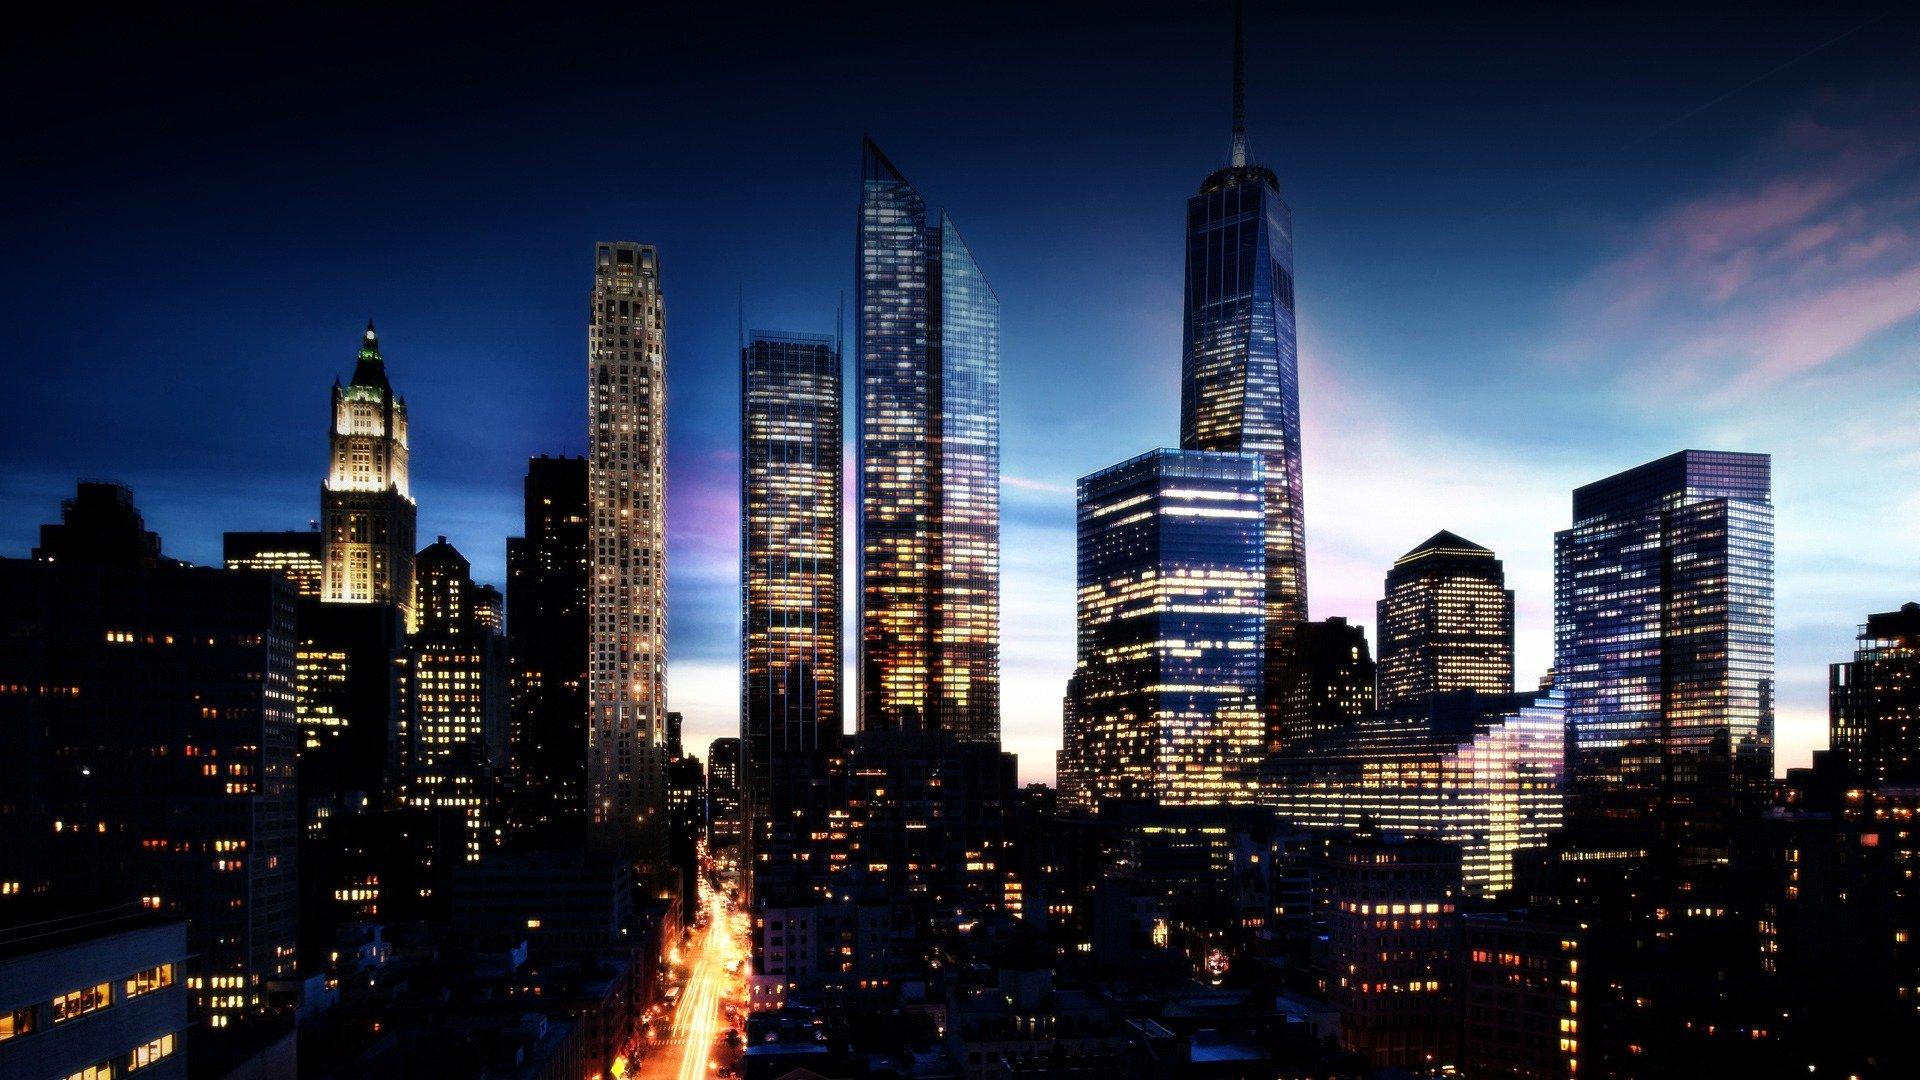 New York Skyline at Night Wallpaper HD 1 City hd background hd ...